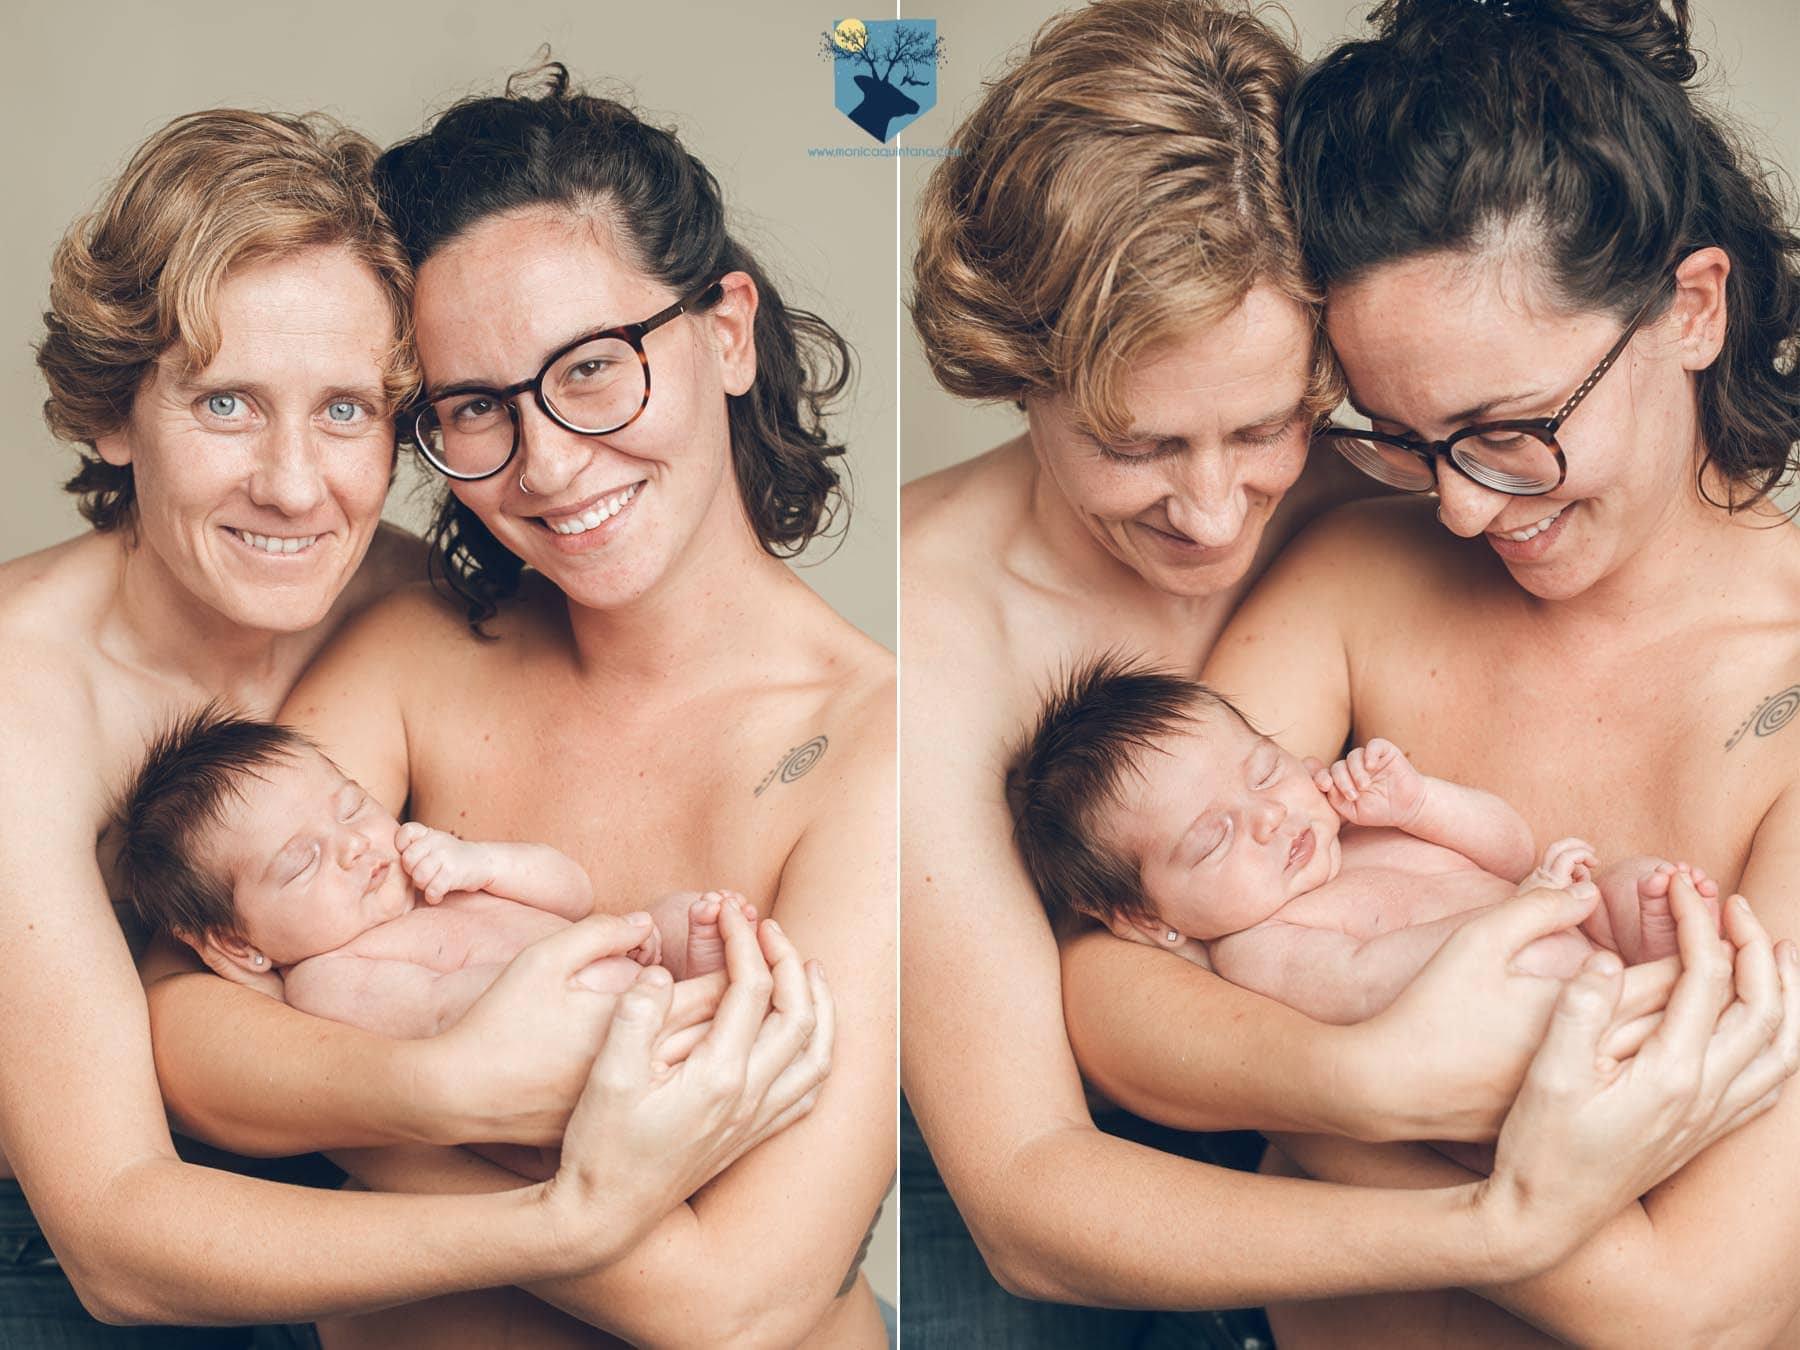 fotografia, fotos, girona, figueres, emporda, monica quintana, bebes, niños, recien nacido, newborn, familia, retrato